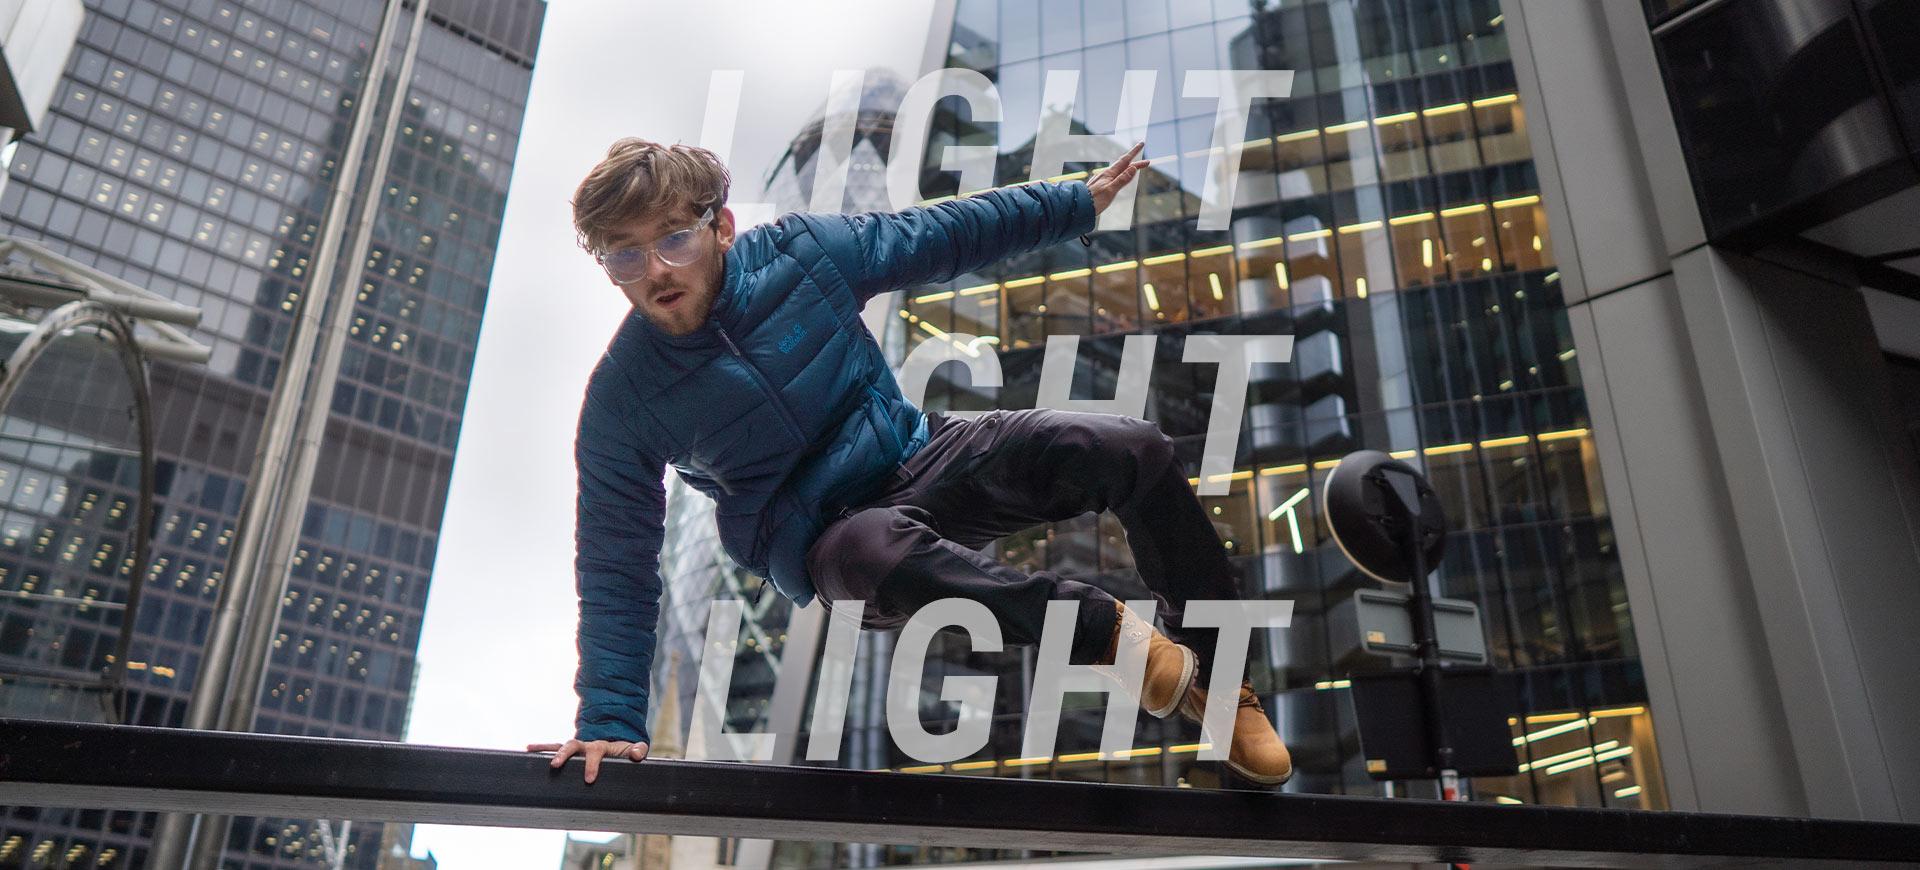 Man jumps over barrier